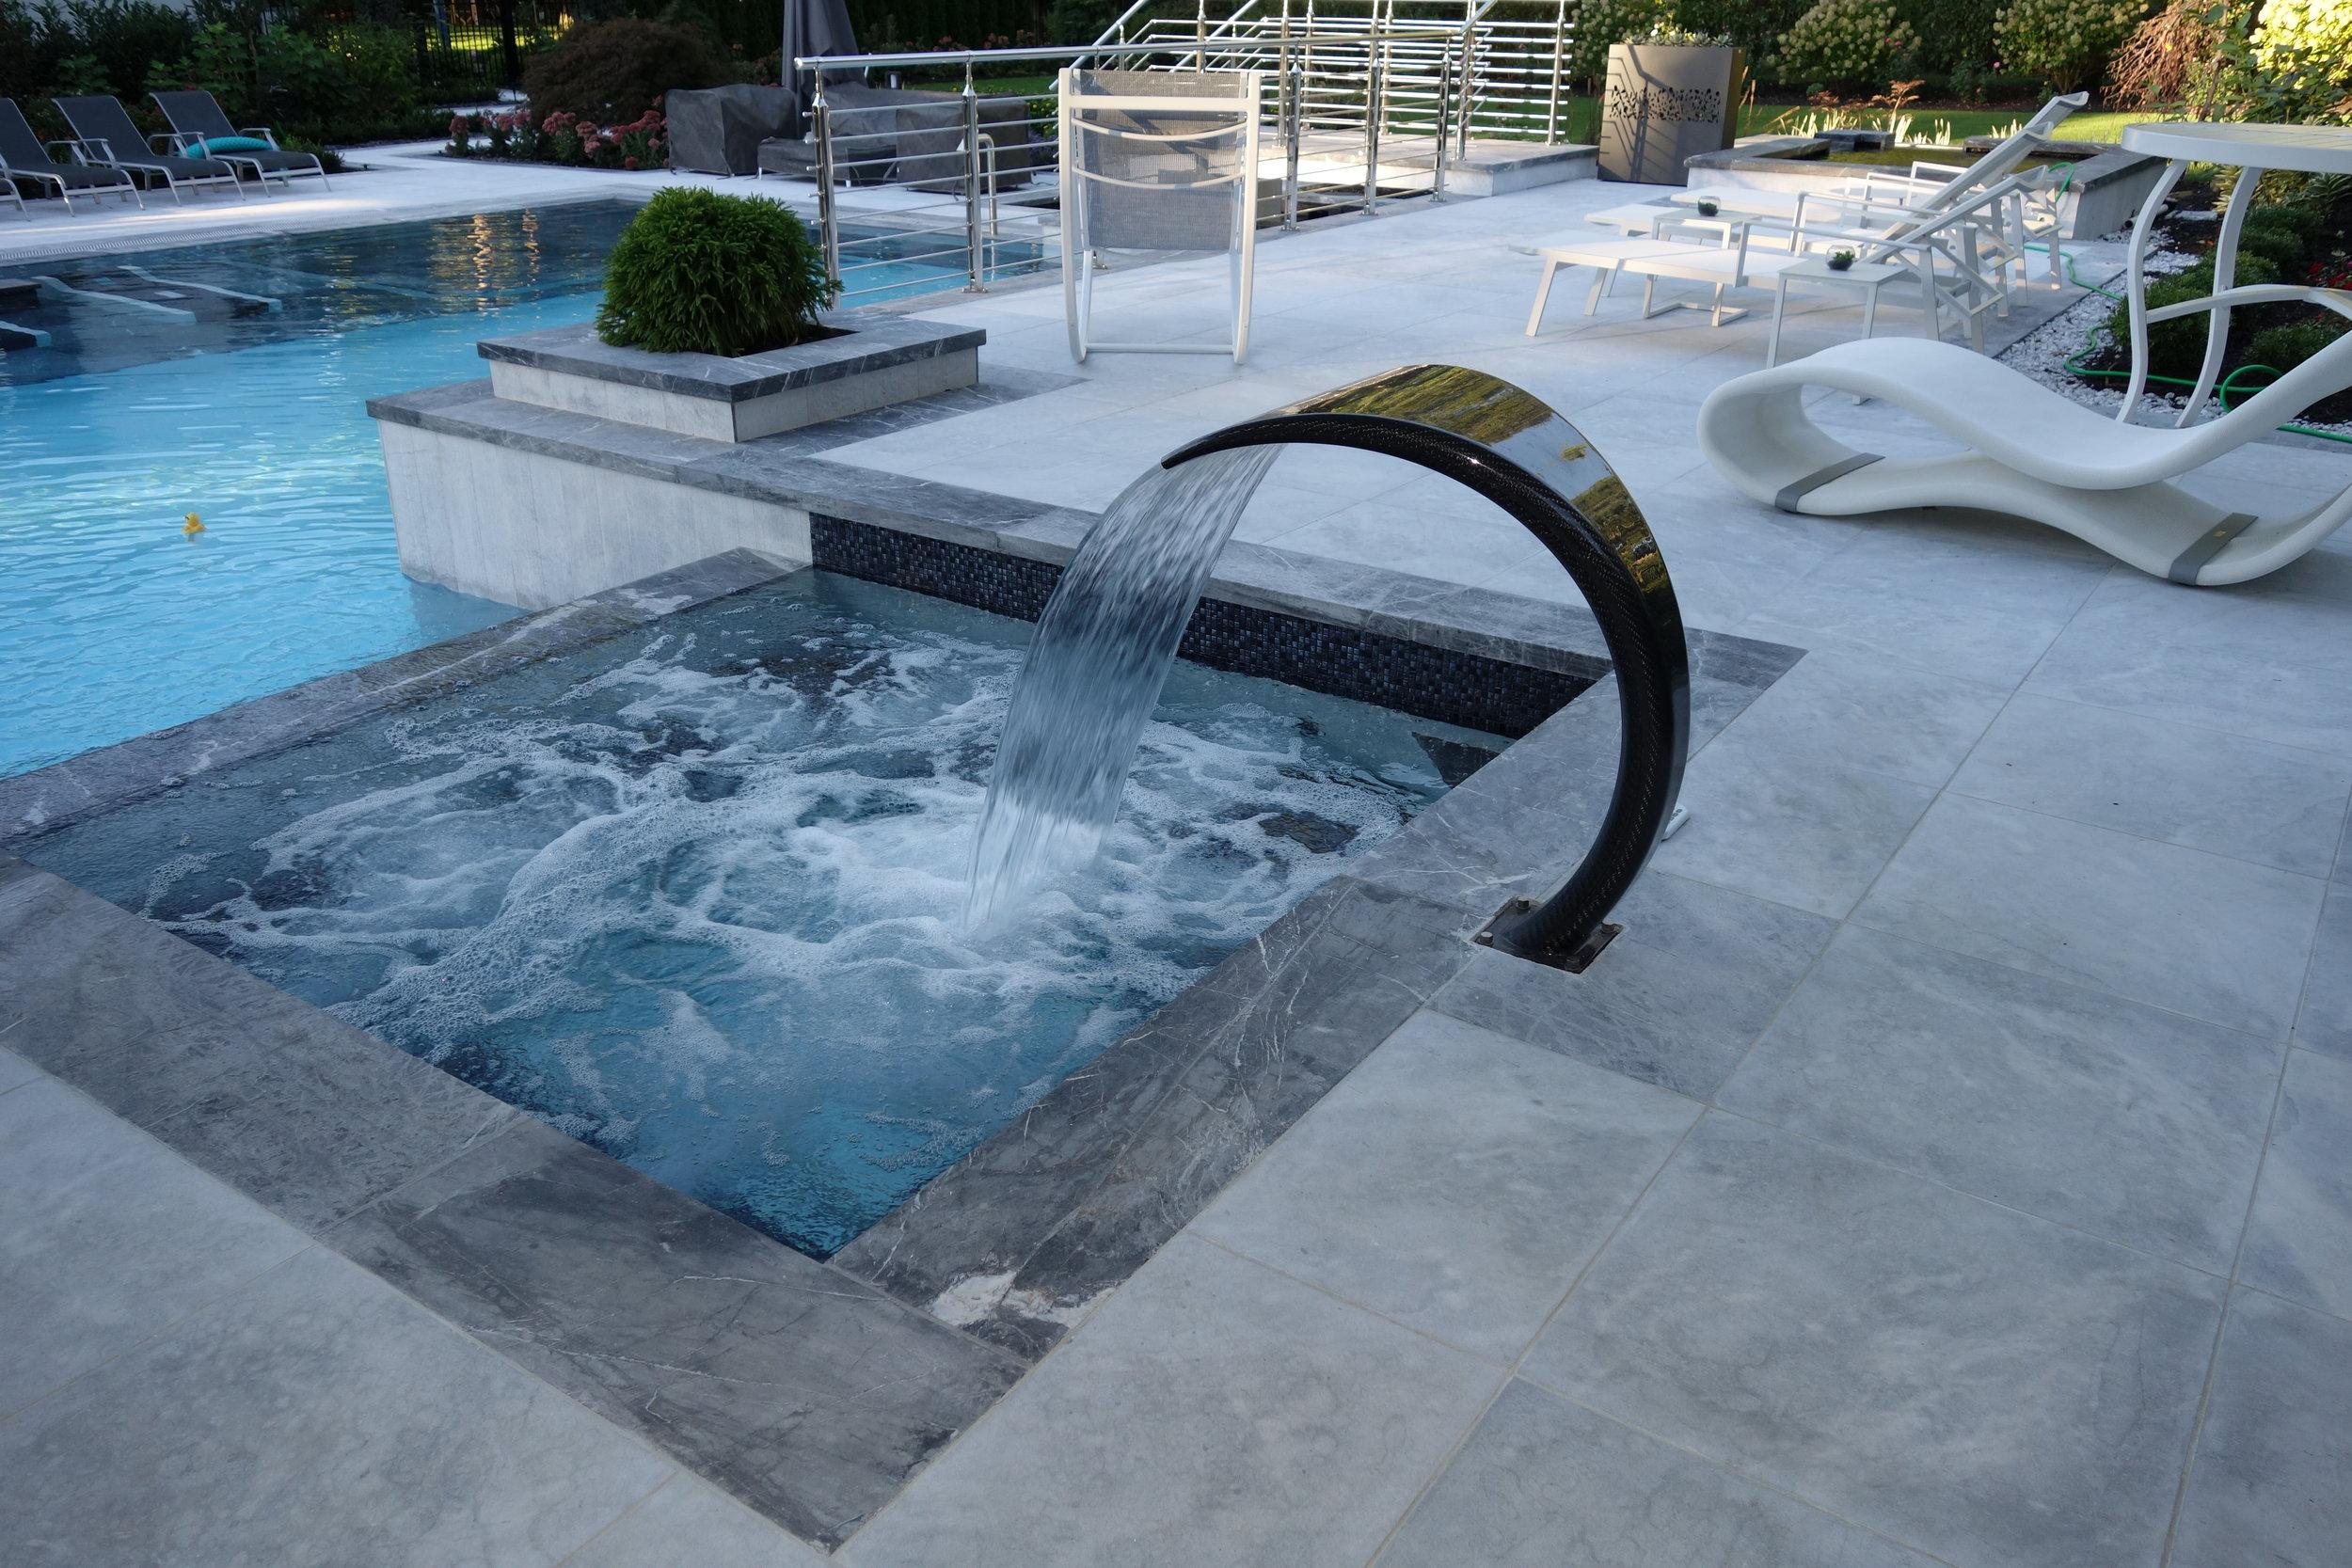 Gunite pool builder in Oyster Bay Cove, NY